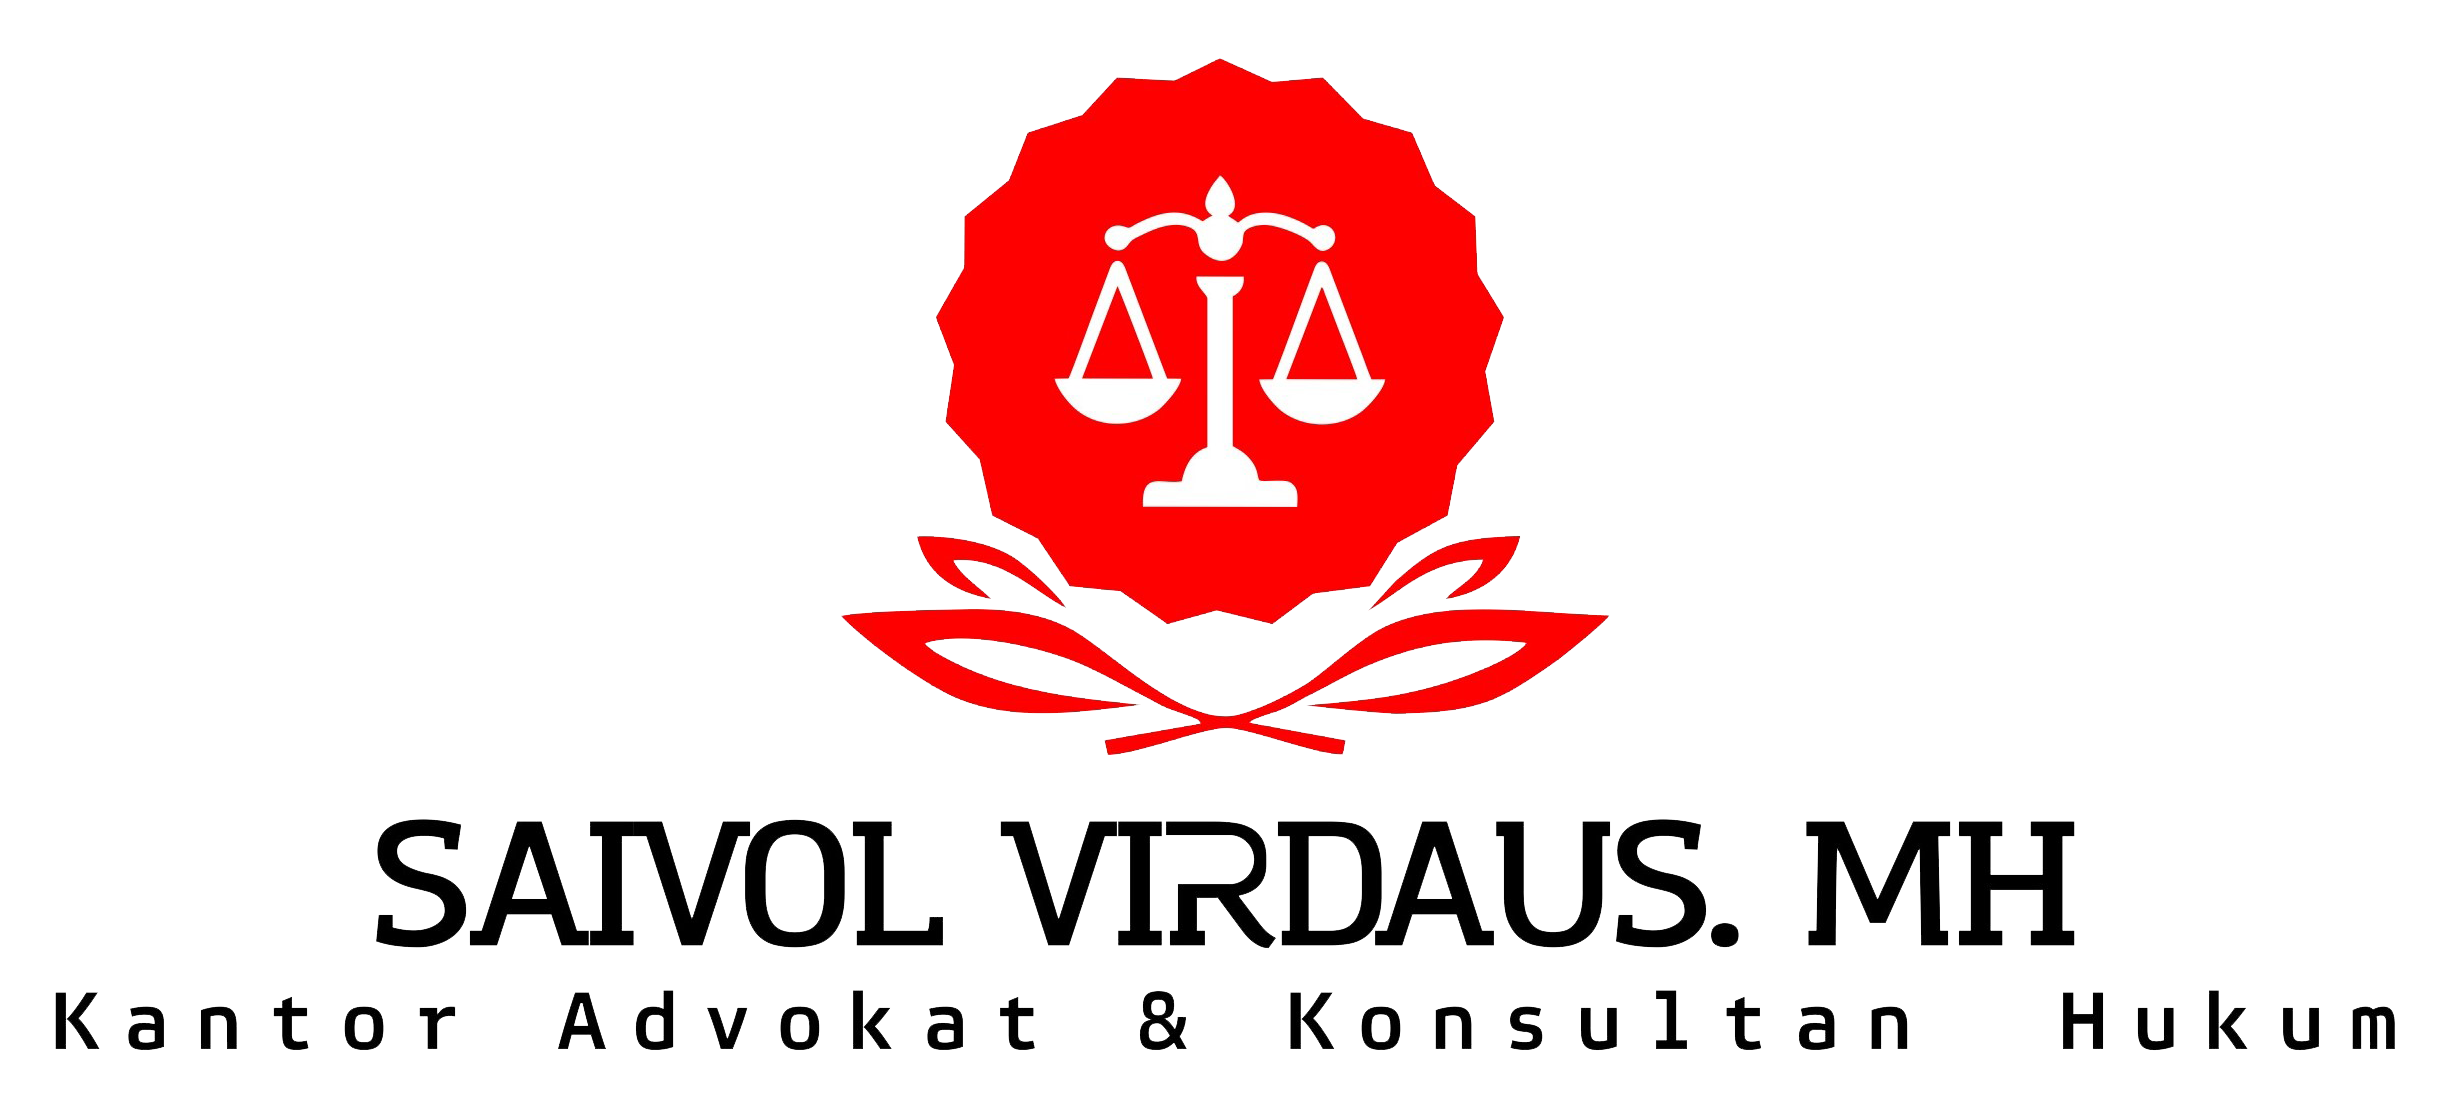 Advokat Tulungagung | Saivol Virdaus